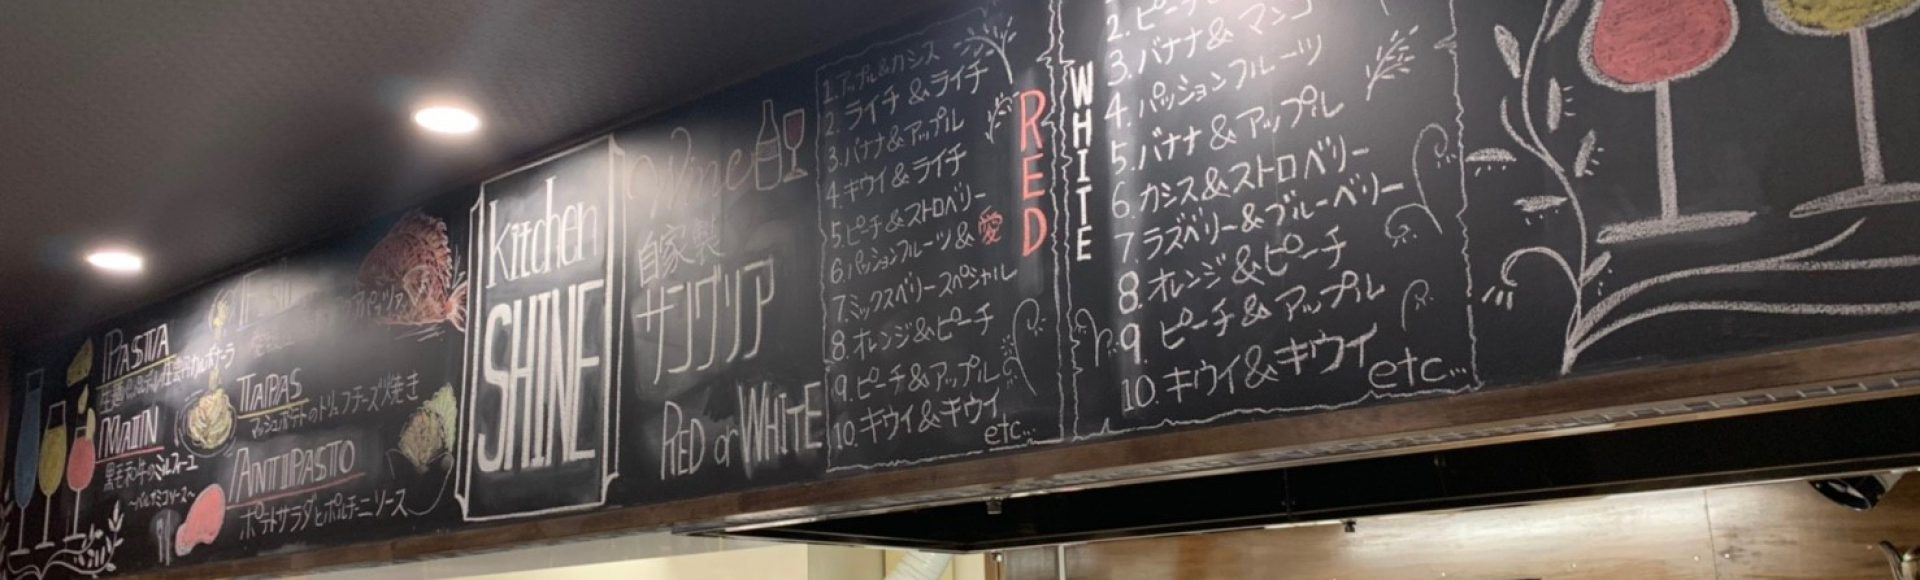 kitchenしゃいん|洋食と鉄板料理がメインの居酒屋